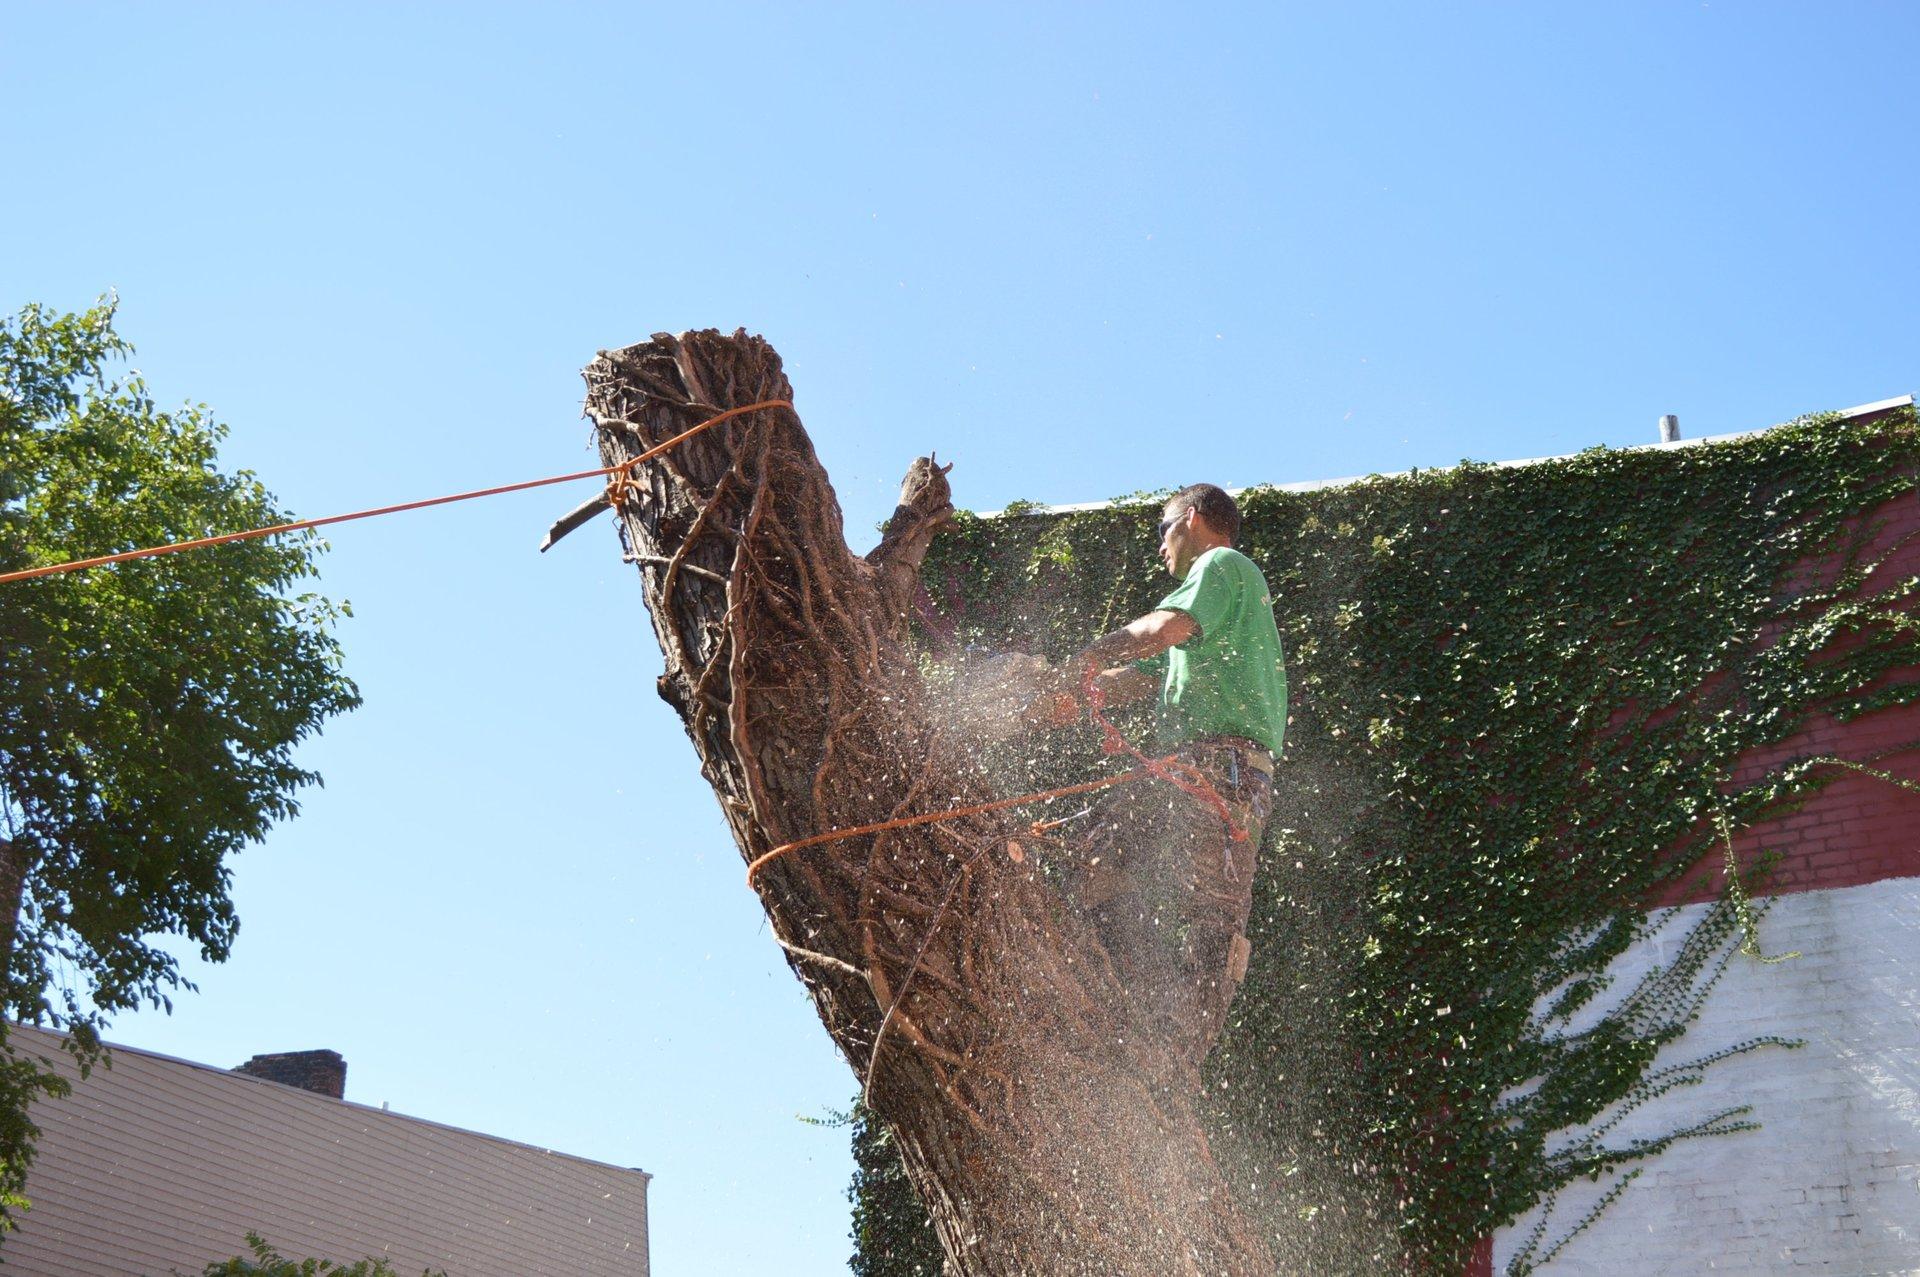 Peru's Tree Service Inc. image 6